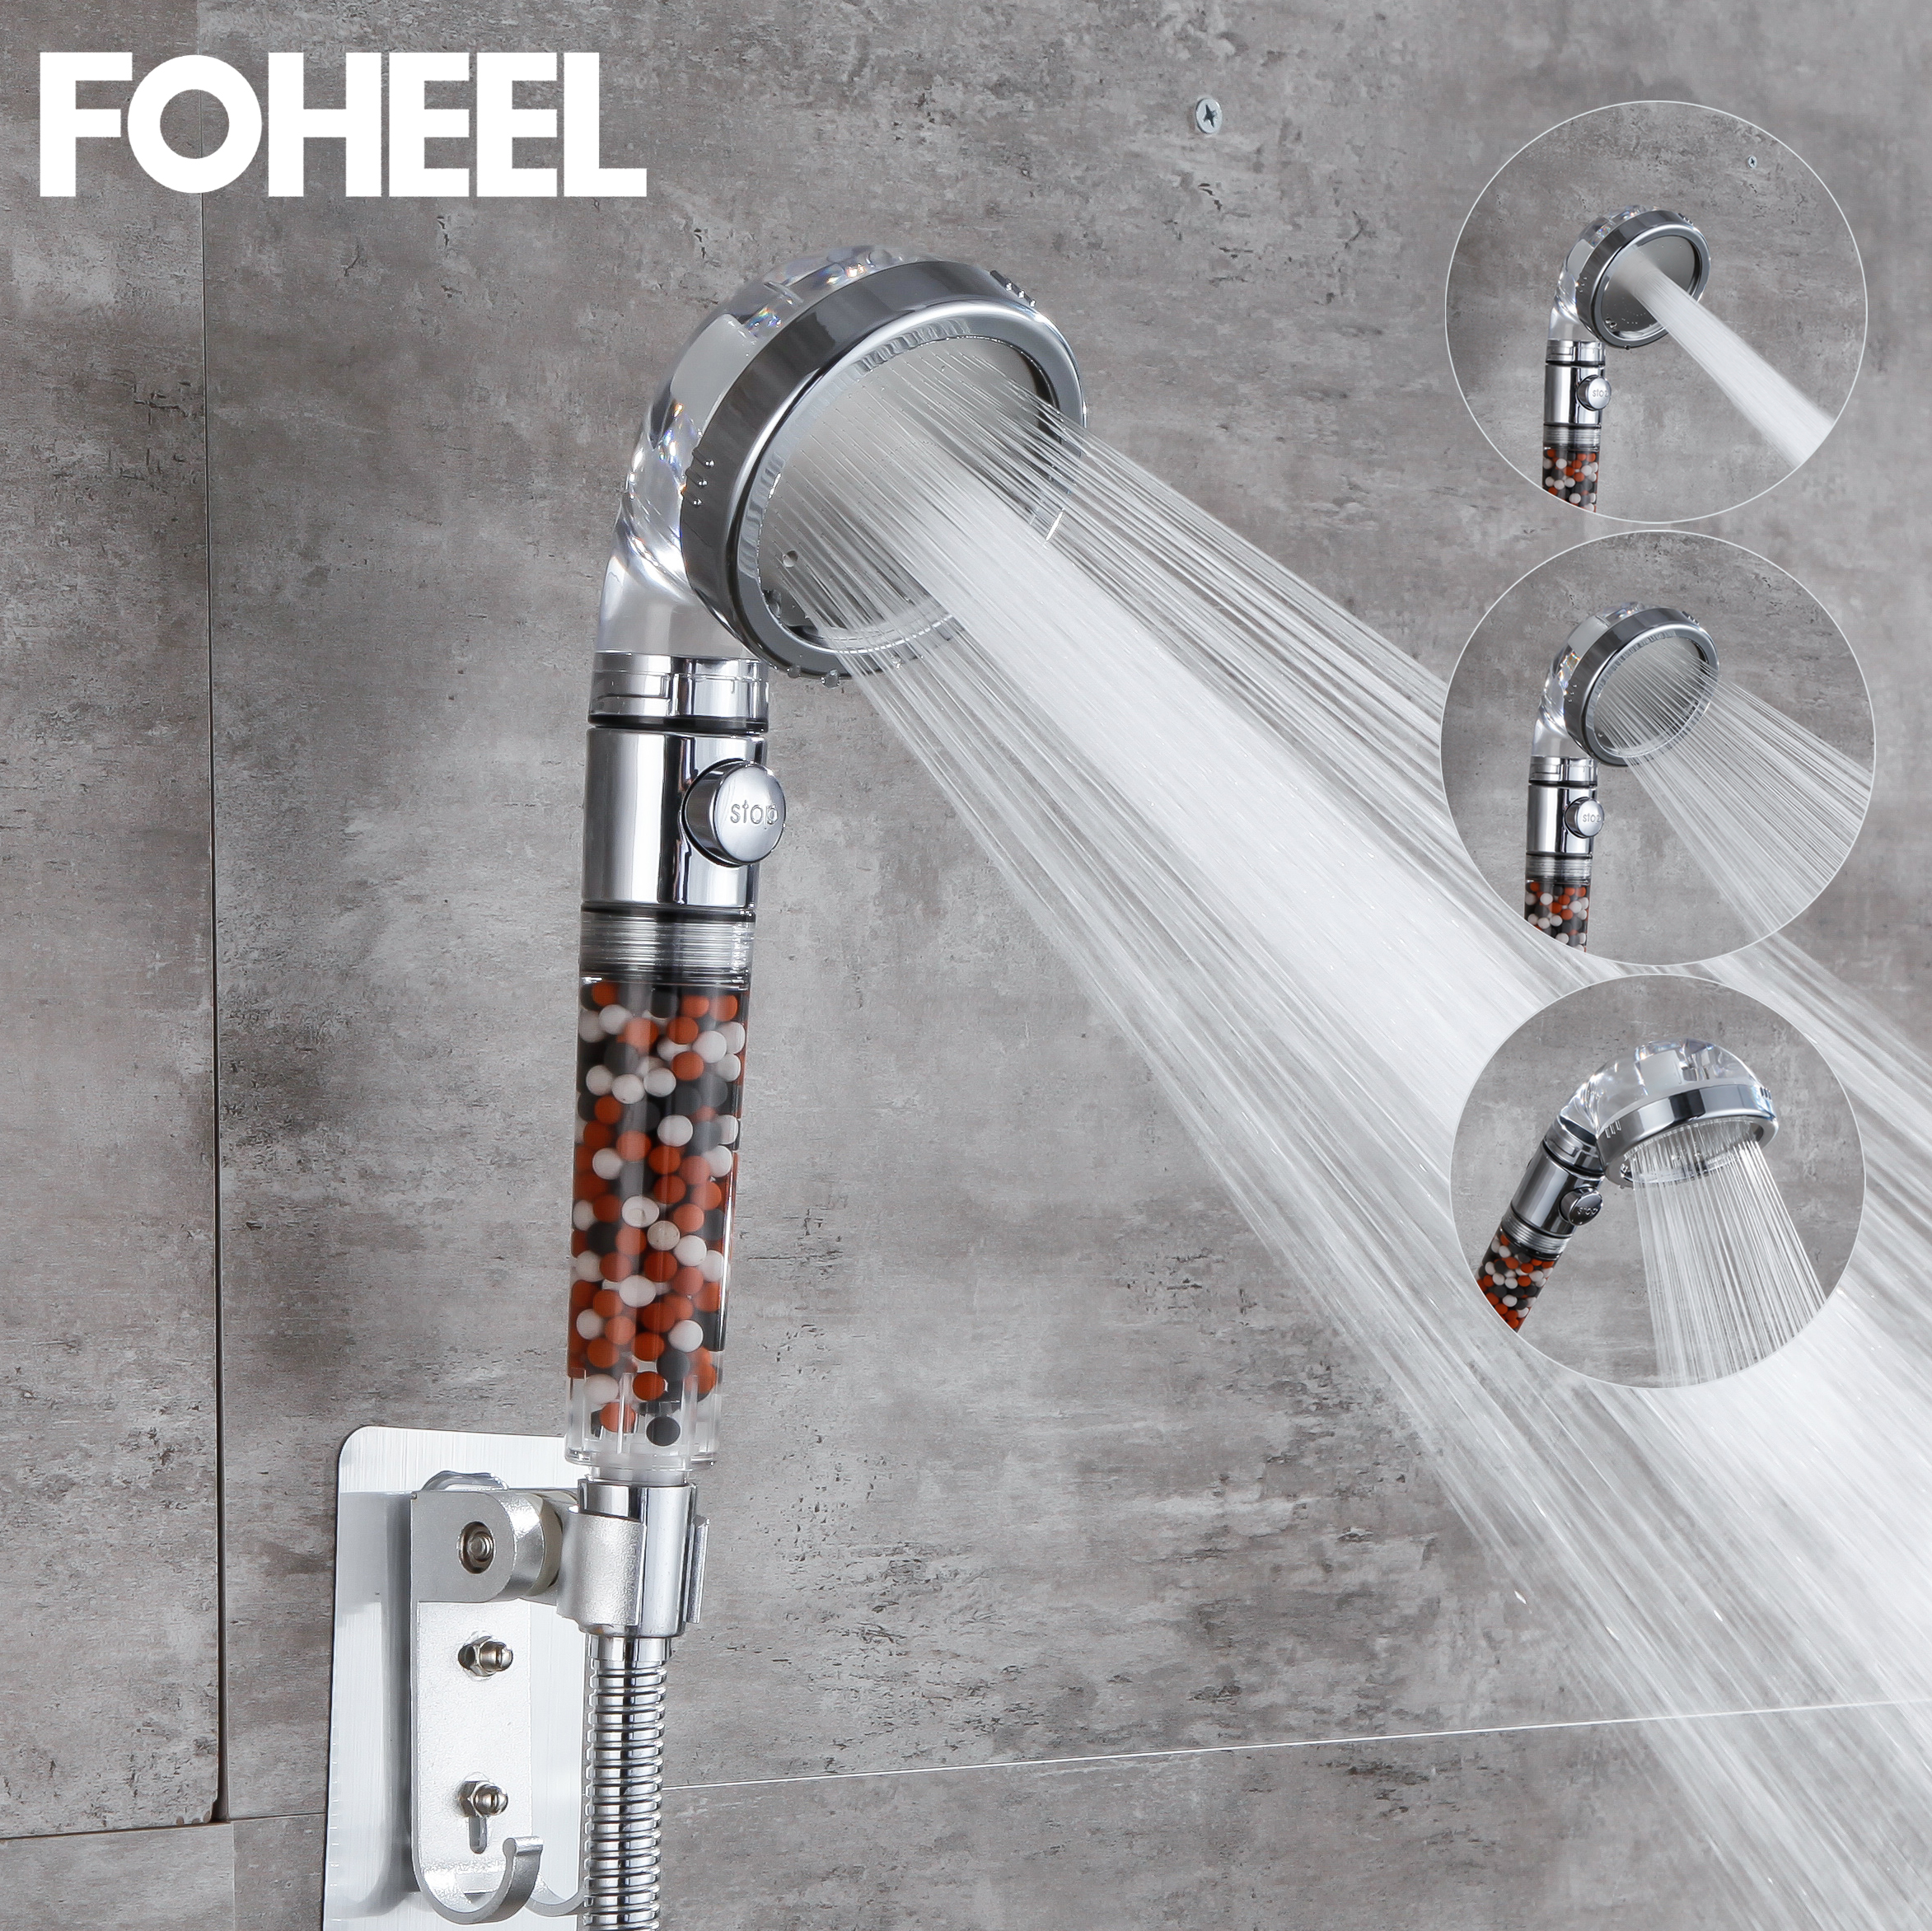 FOHEEL Shower Head Adjustable 3 Mode Shower Head Hand Shower High Pressure Water Saving One Button To Stop Water Shower Heads 1